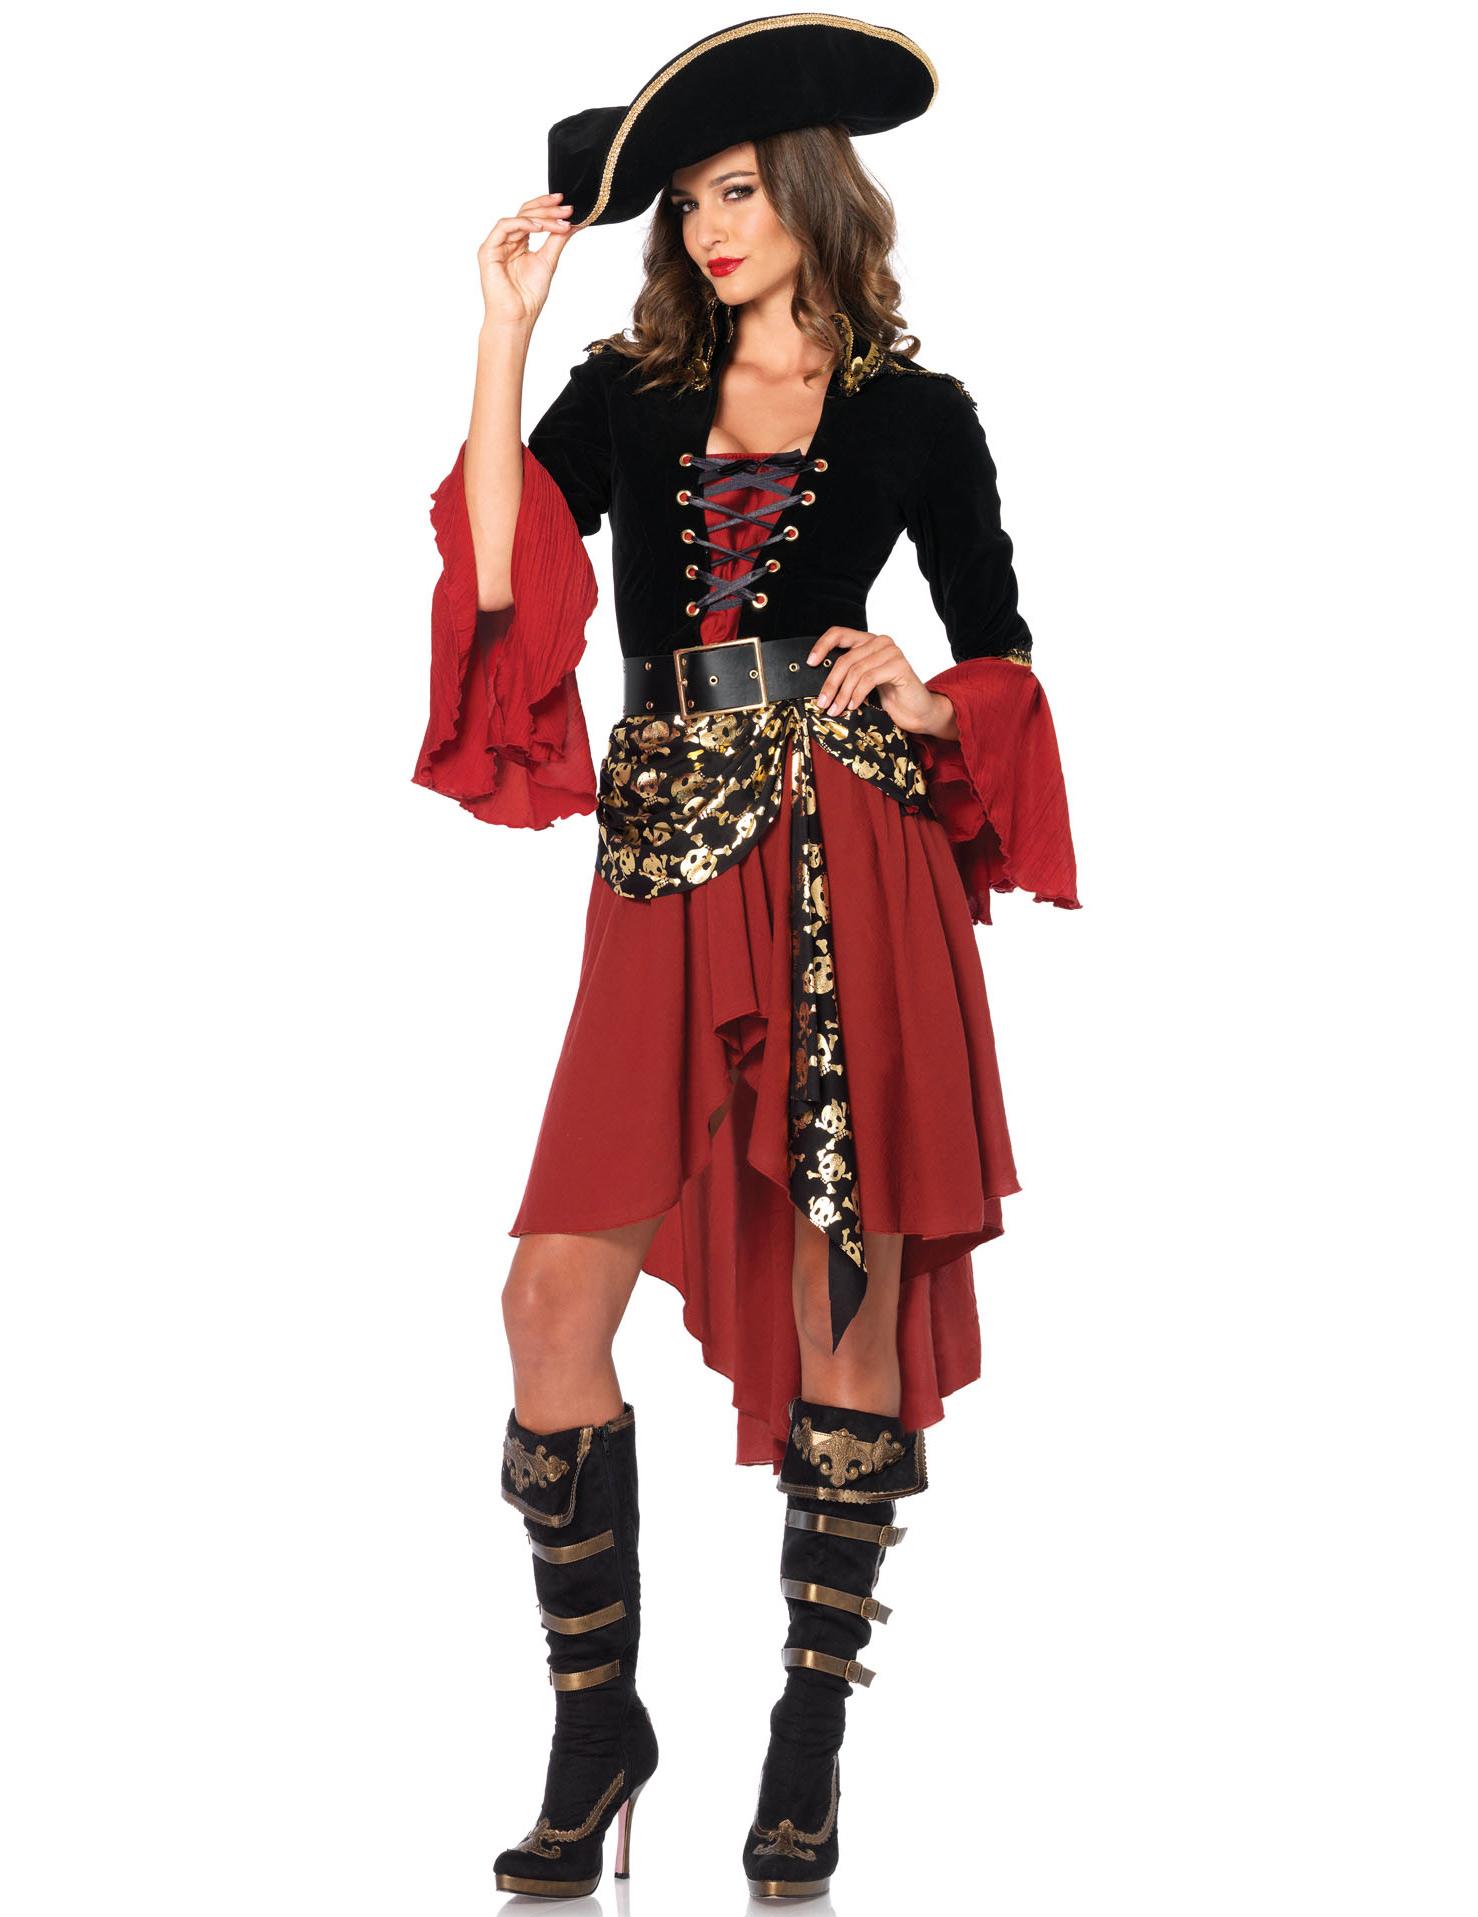 elegantes piraten kost m f r frauen kost me f r. Black Bedroom Furniture Sets. Home Design Ideas